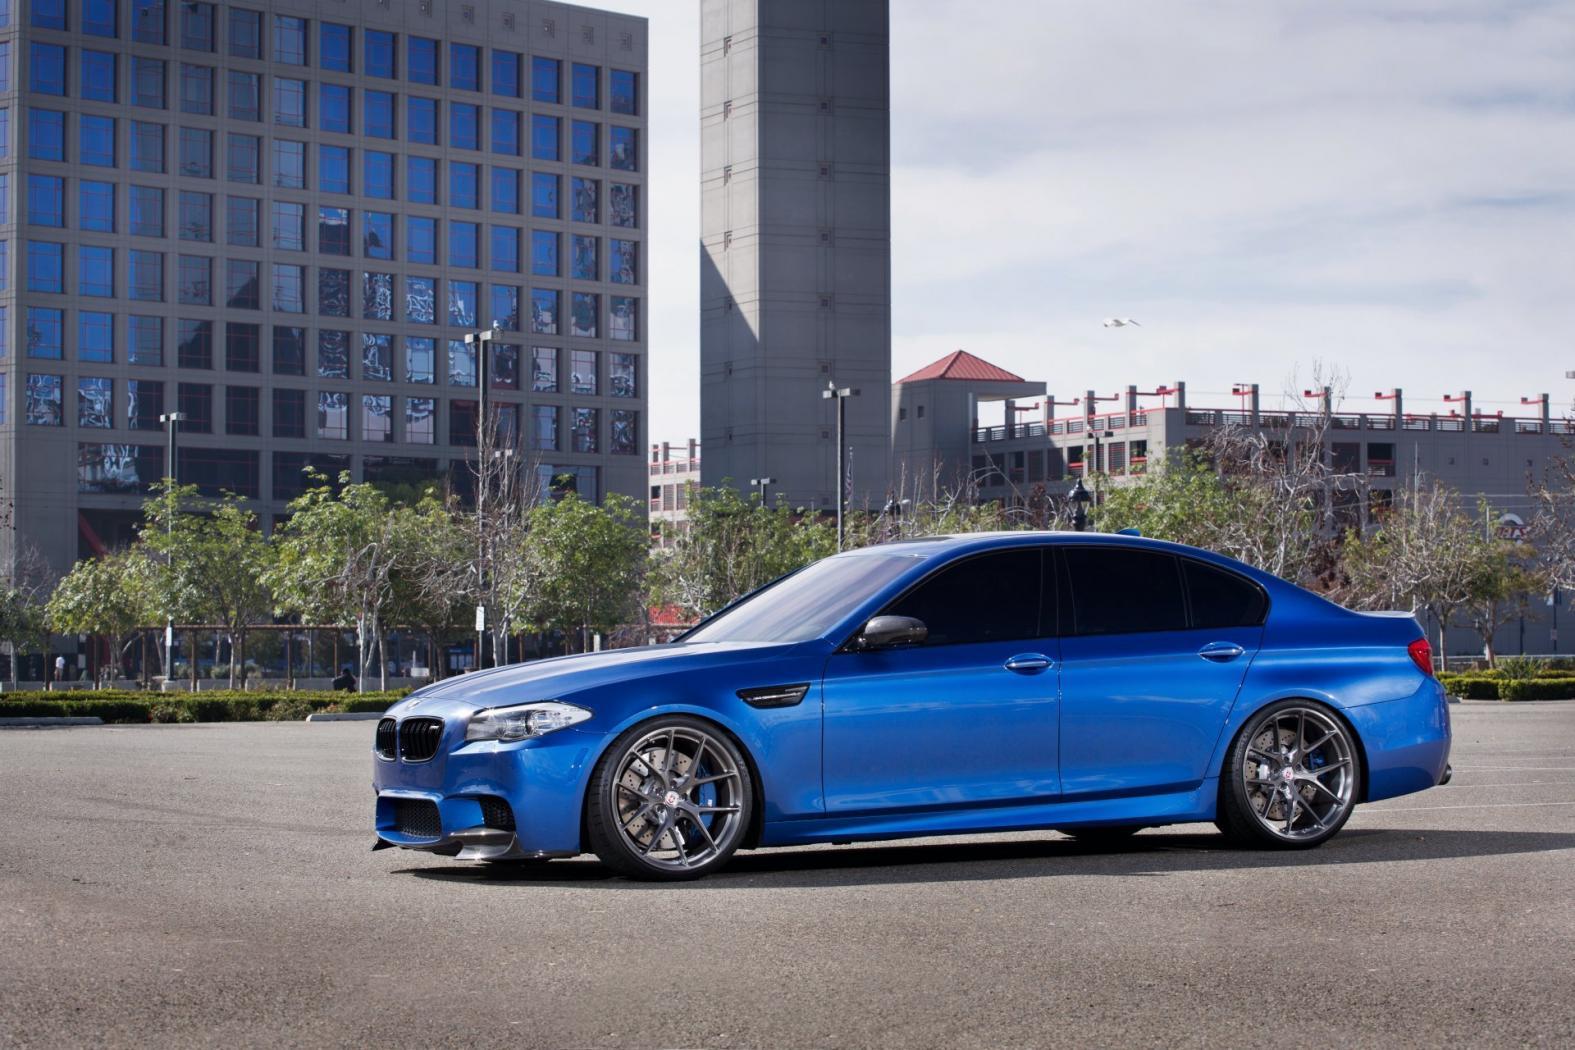 BMW-M5-F10-7.jpeg